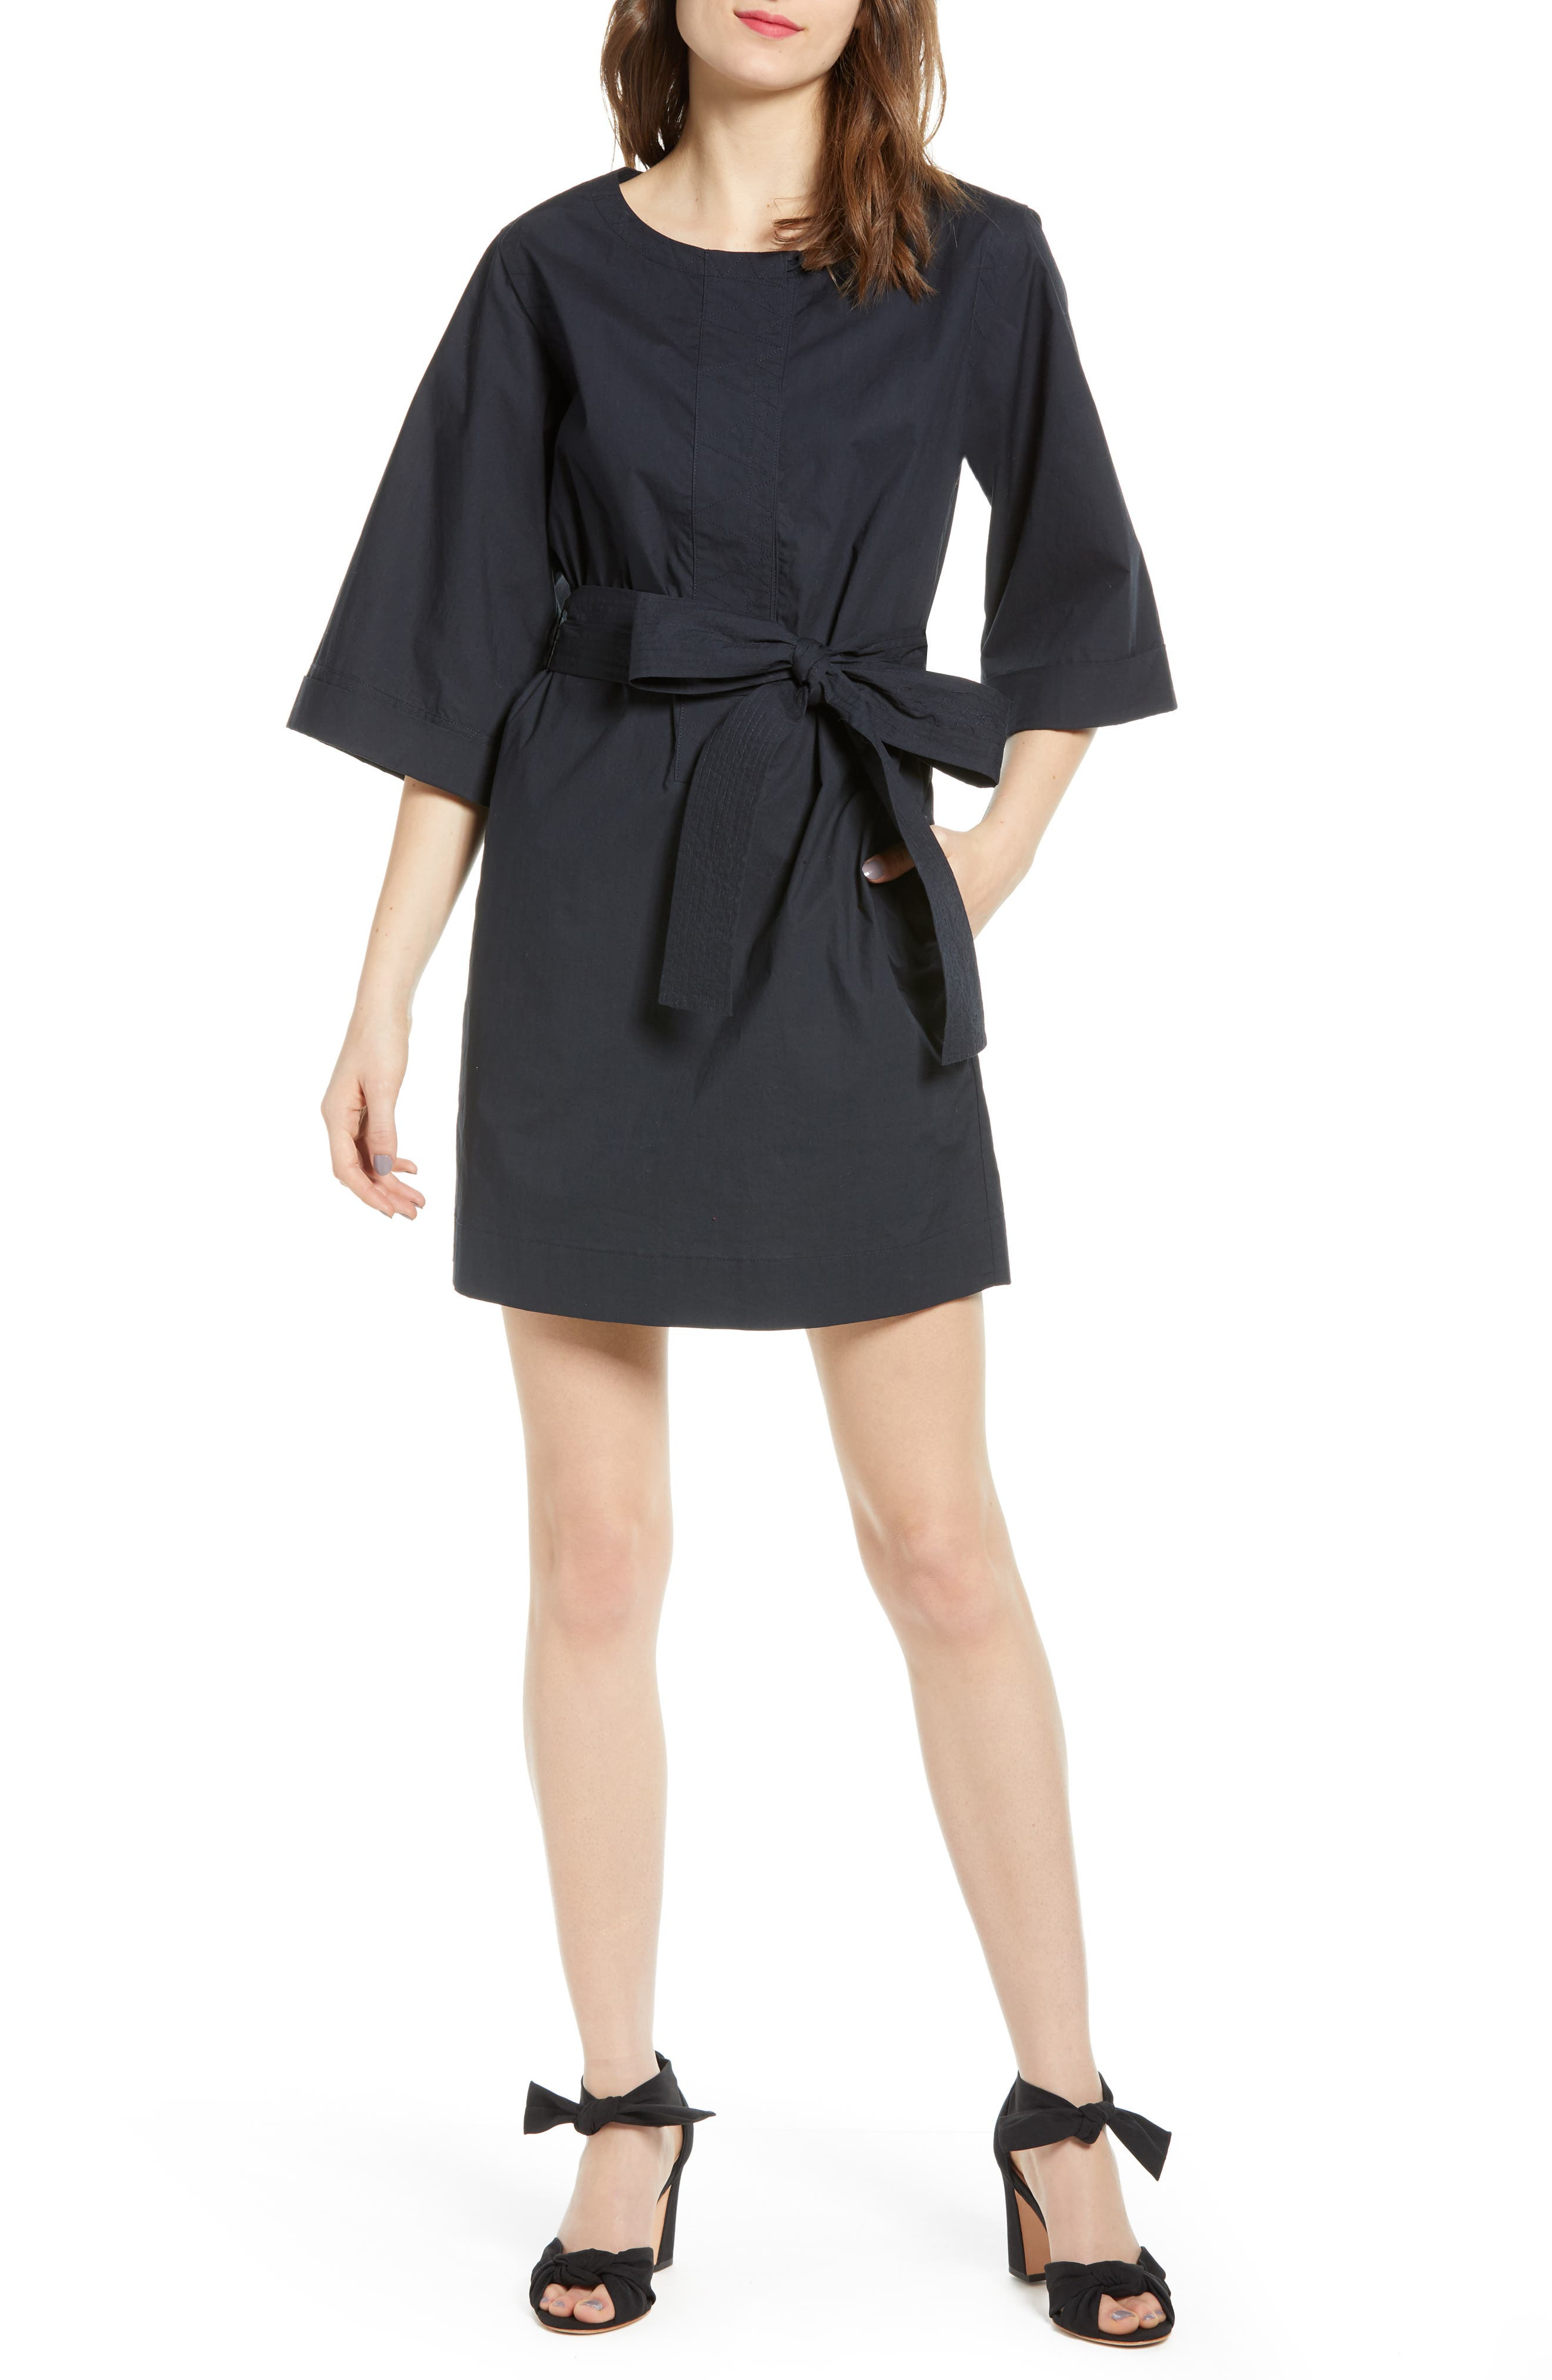 Rebecca Minkoff Violet Dress, Black